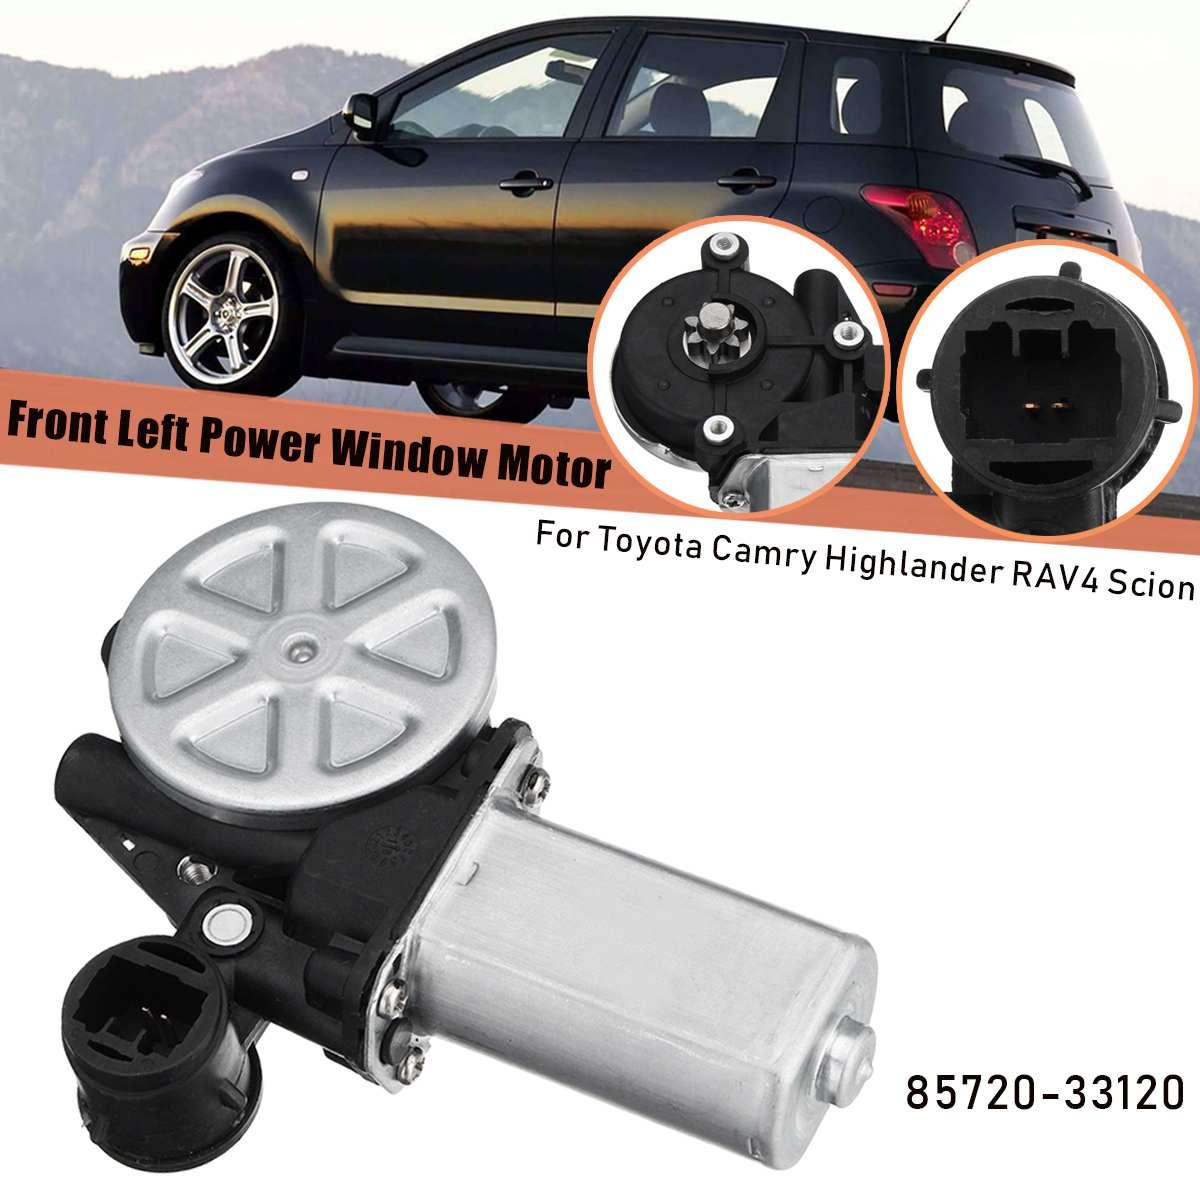 47-10009 Front Left Power Window Motor For Toyota Camry Highlander RAV4 Scion 85720-33120